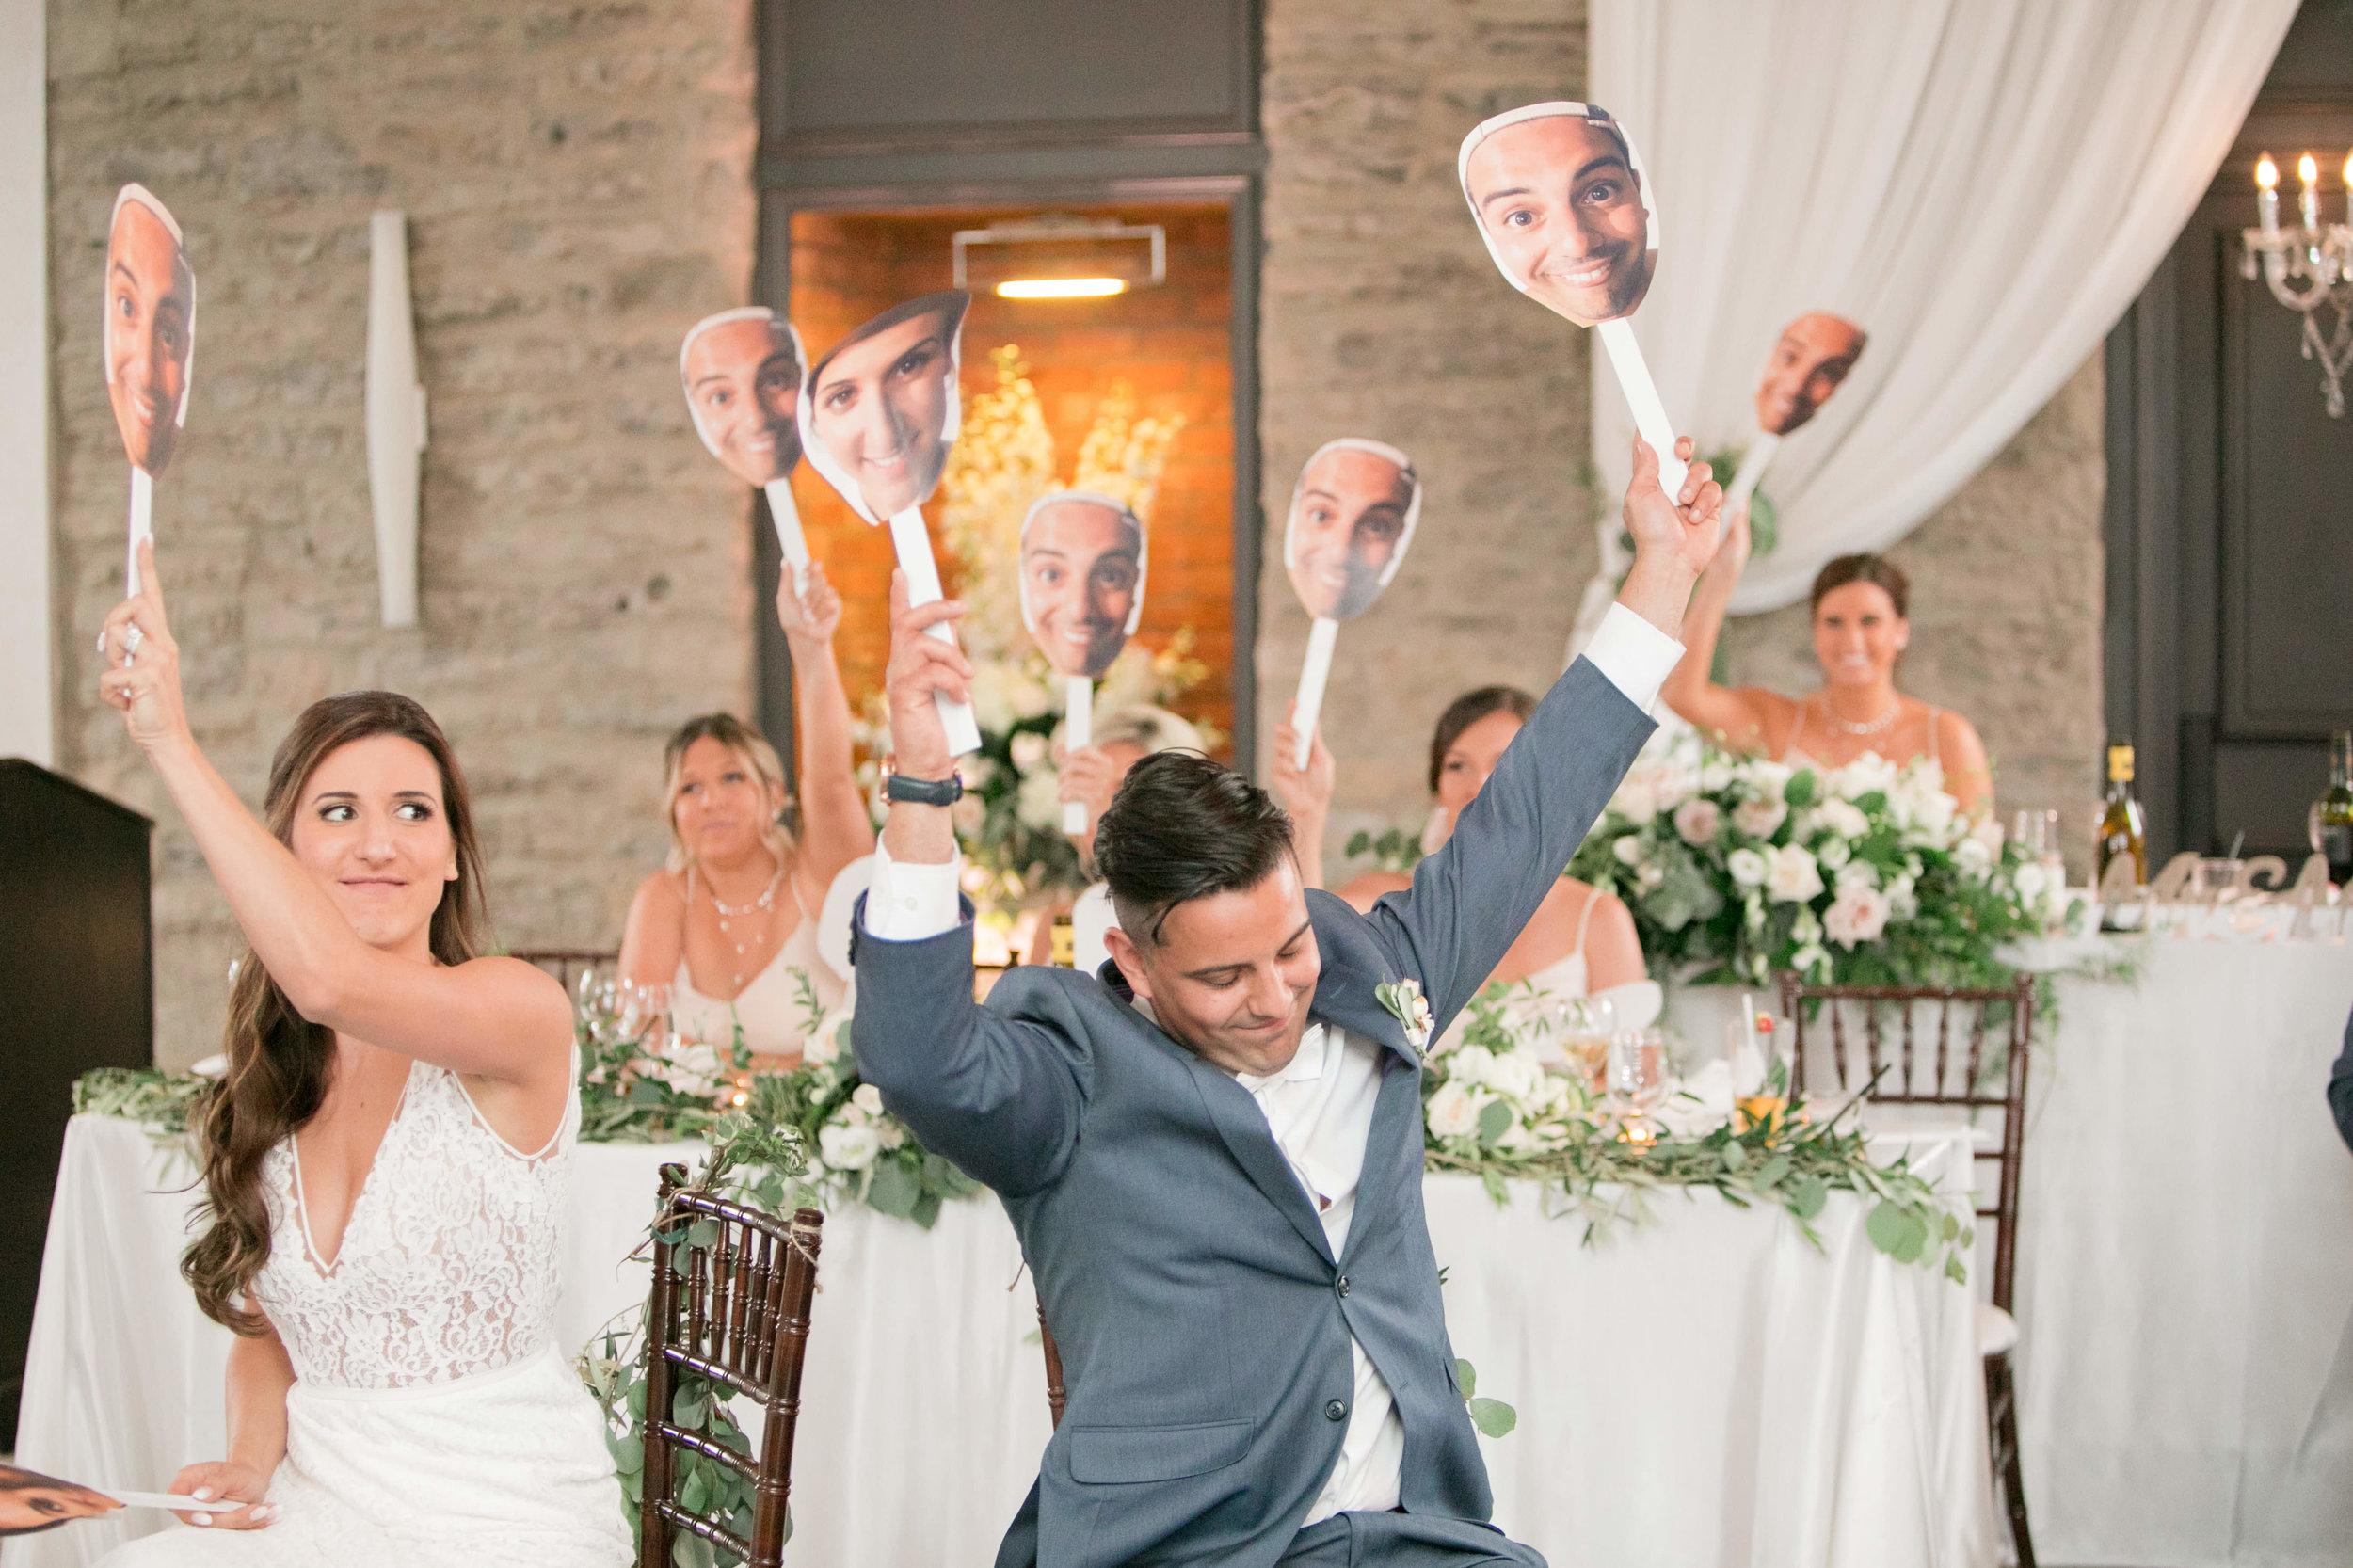 Miranda___Daniel___Daniel_Ricci_Weddings___High_Res._Finals_655.jpg